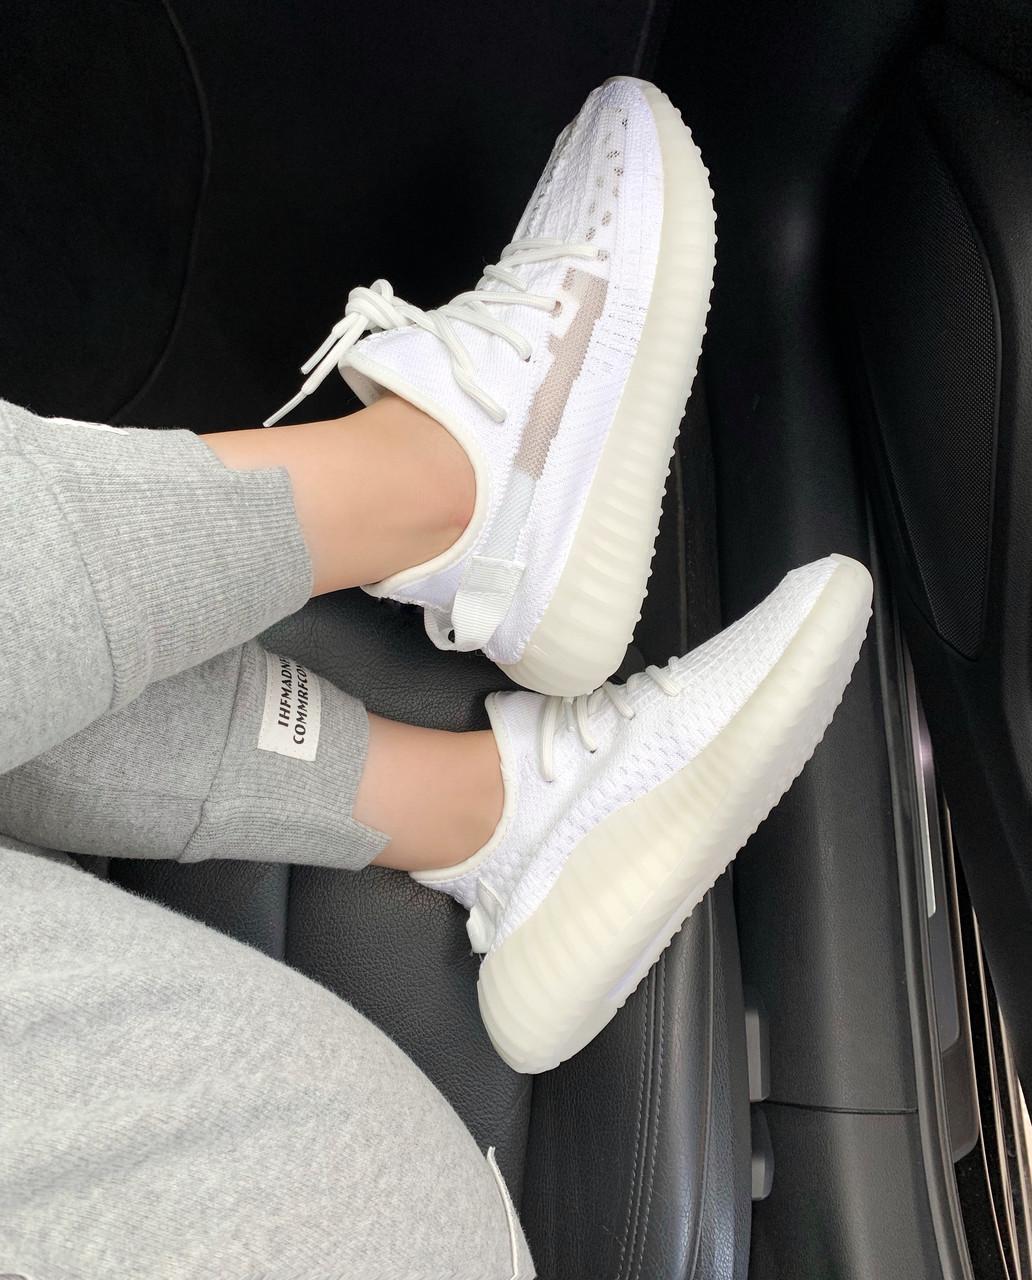 Adidas Yeezy Boost 350 v2 Clear White | кроссовки женские и мужские; летниевесенние; белые